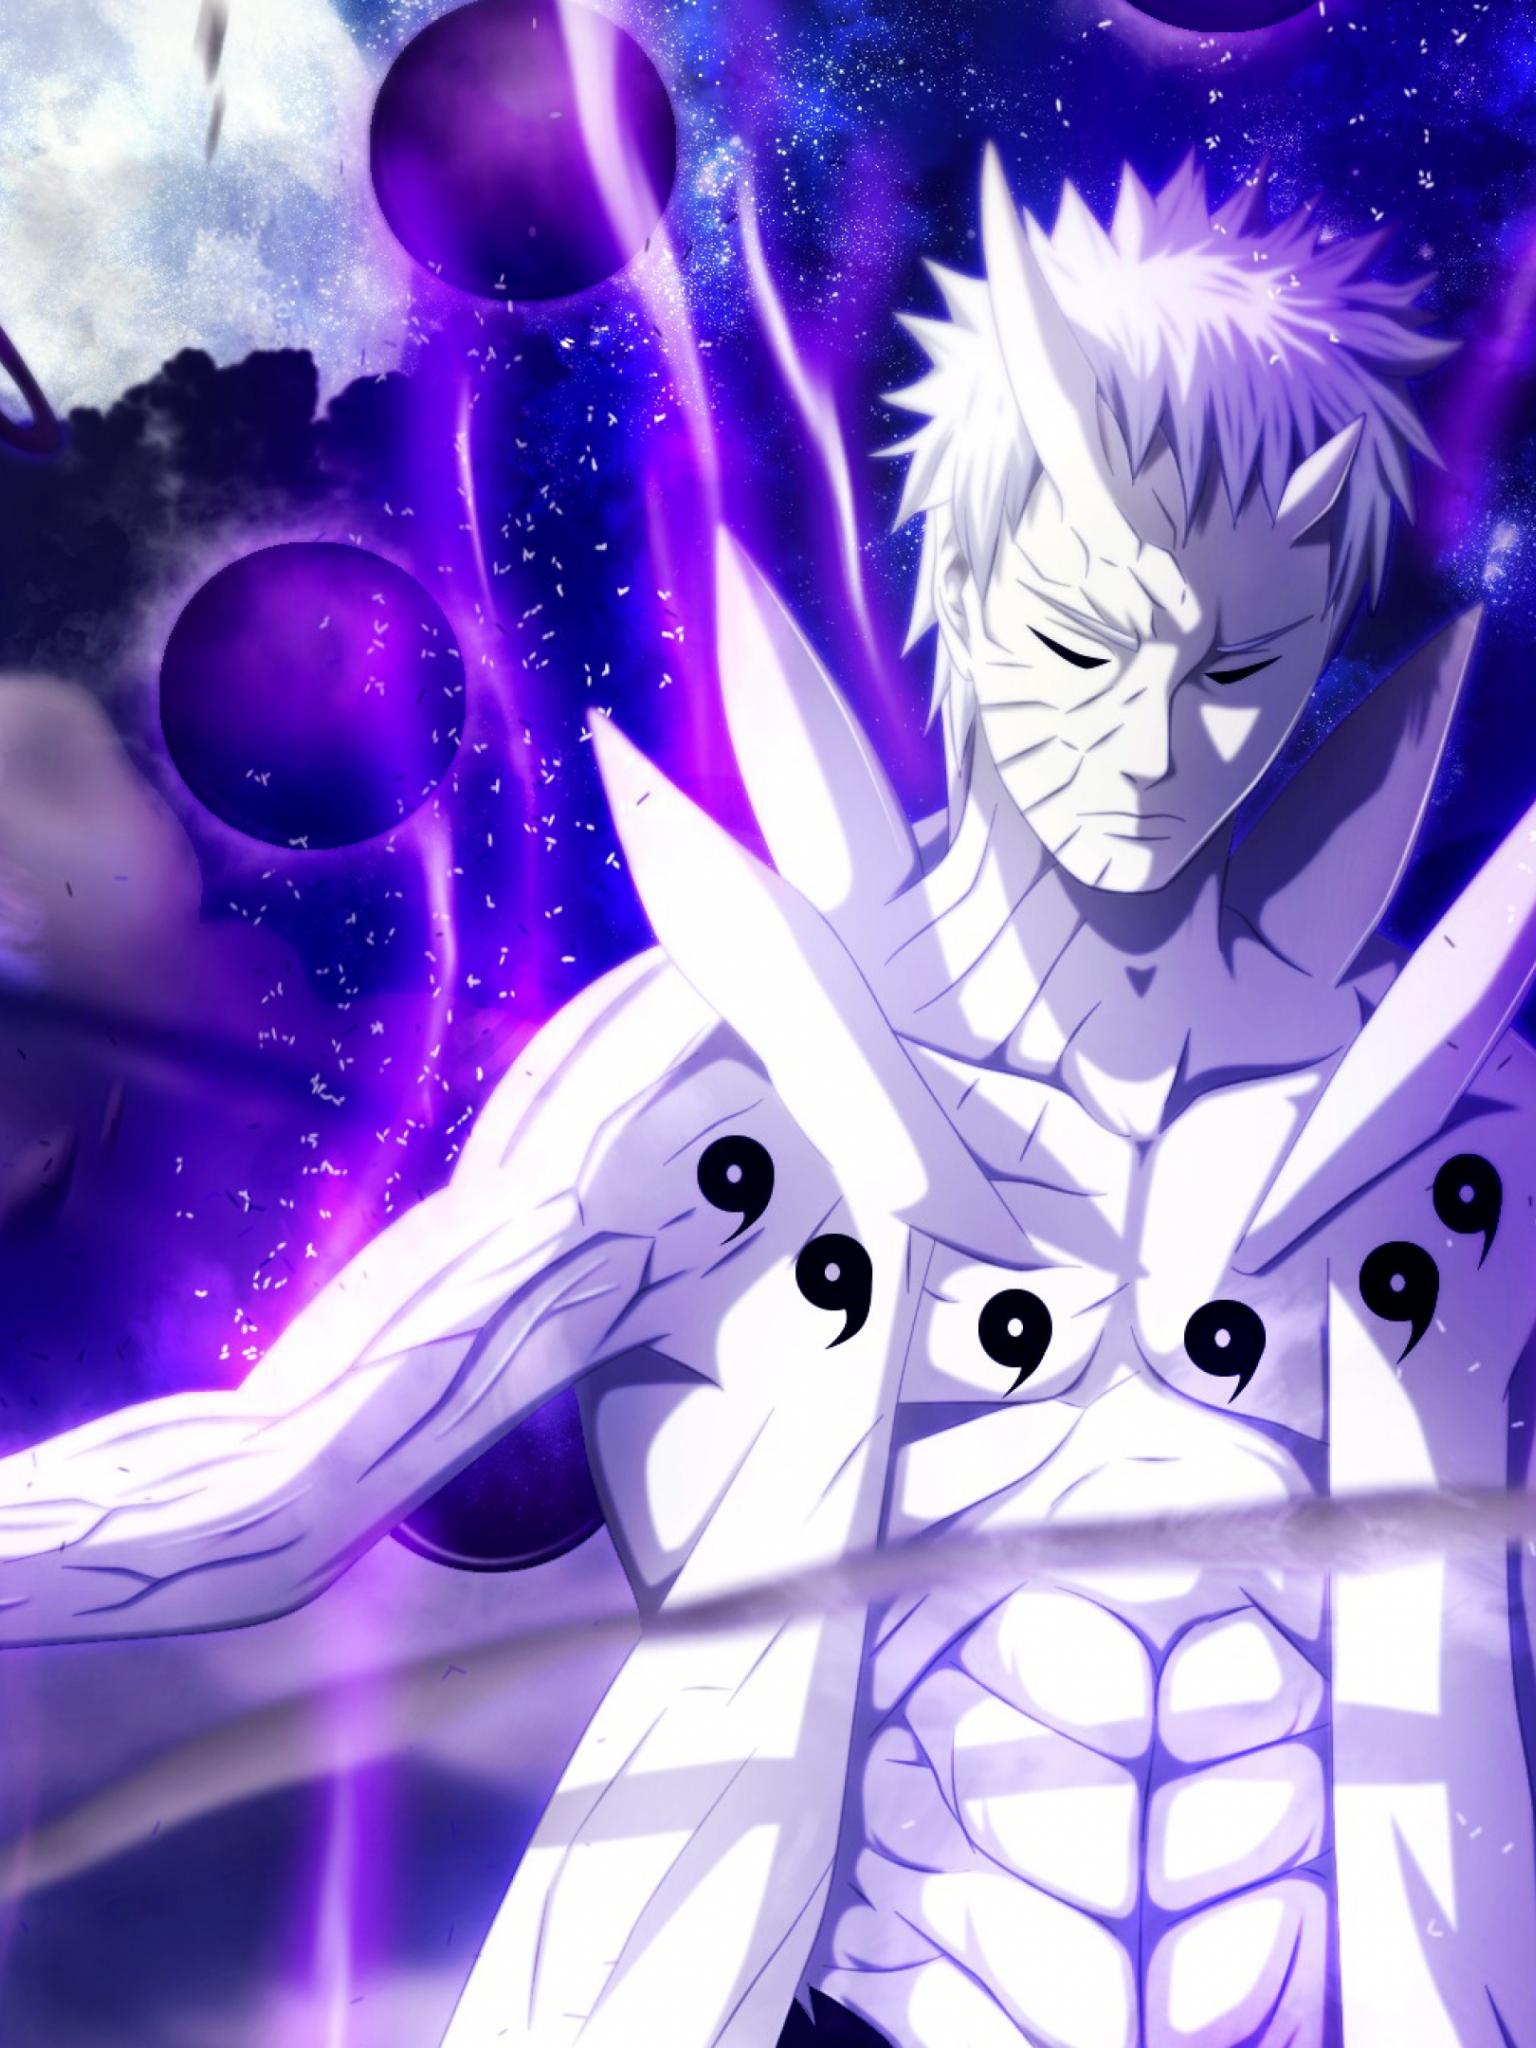 Free download Download Wallpaper 3840x2160 Kortex Anime Naruto Tobi Uchiha  obito [3840x2160] for your Desktop, Mobile & Tablet | Explore 41+ 4K Naruto  Wallpaper | Naruto Desktop Wallpaper, 4K One Piece Wallpaper,